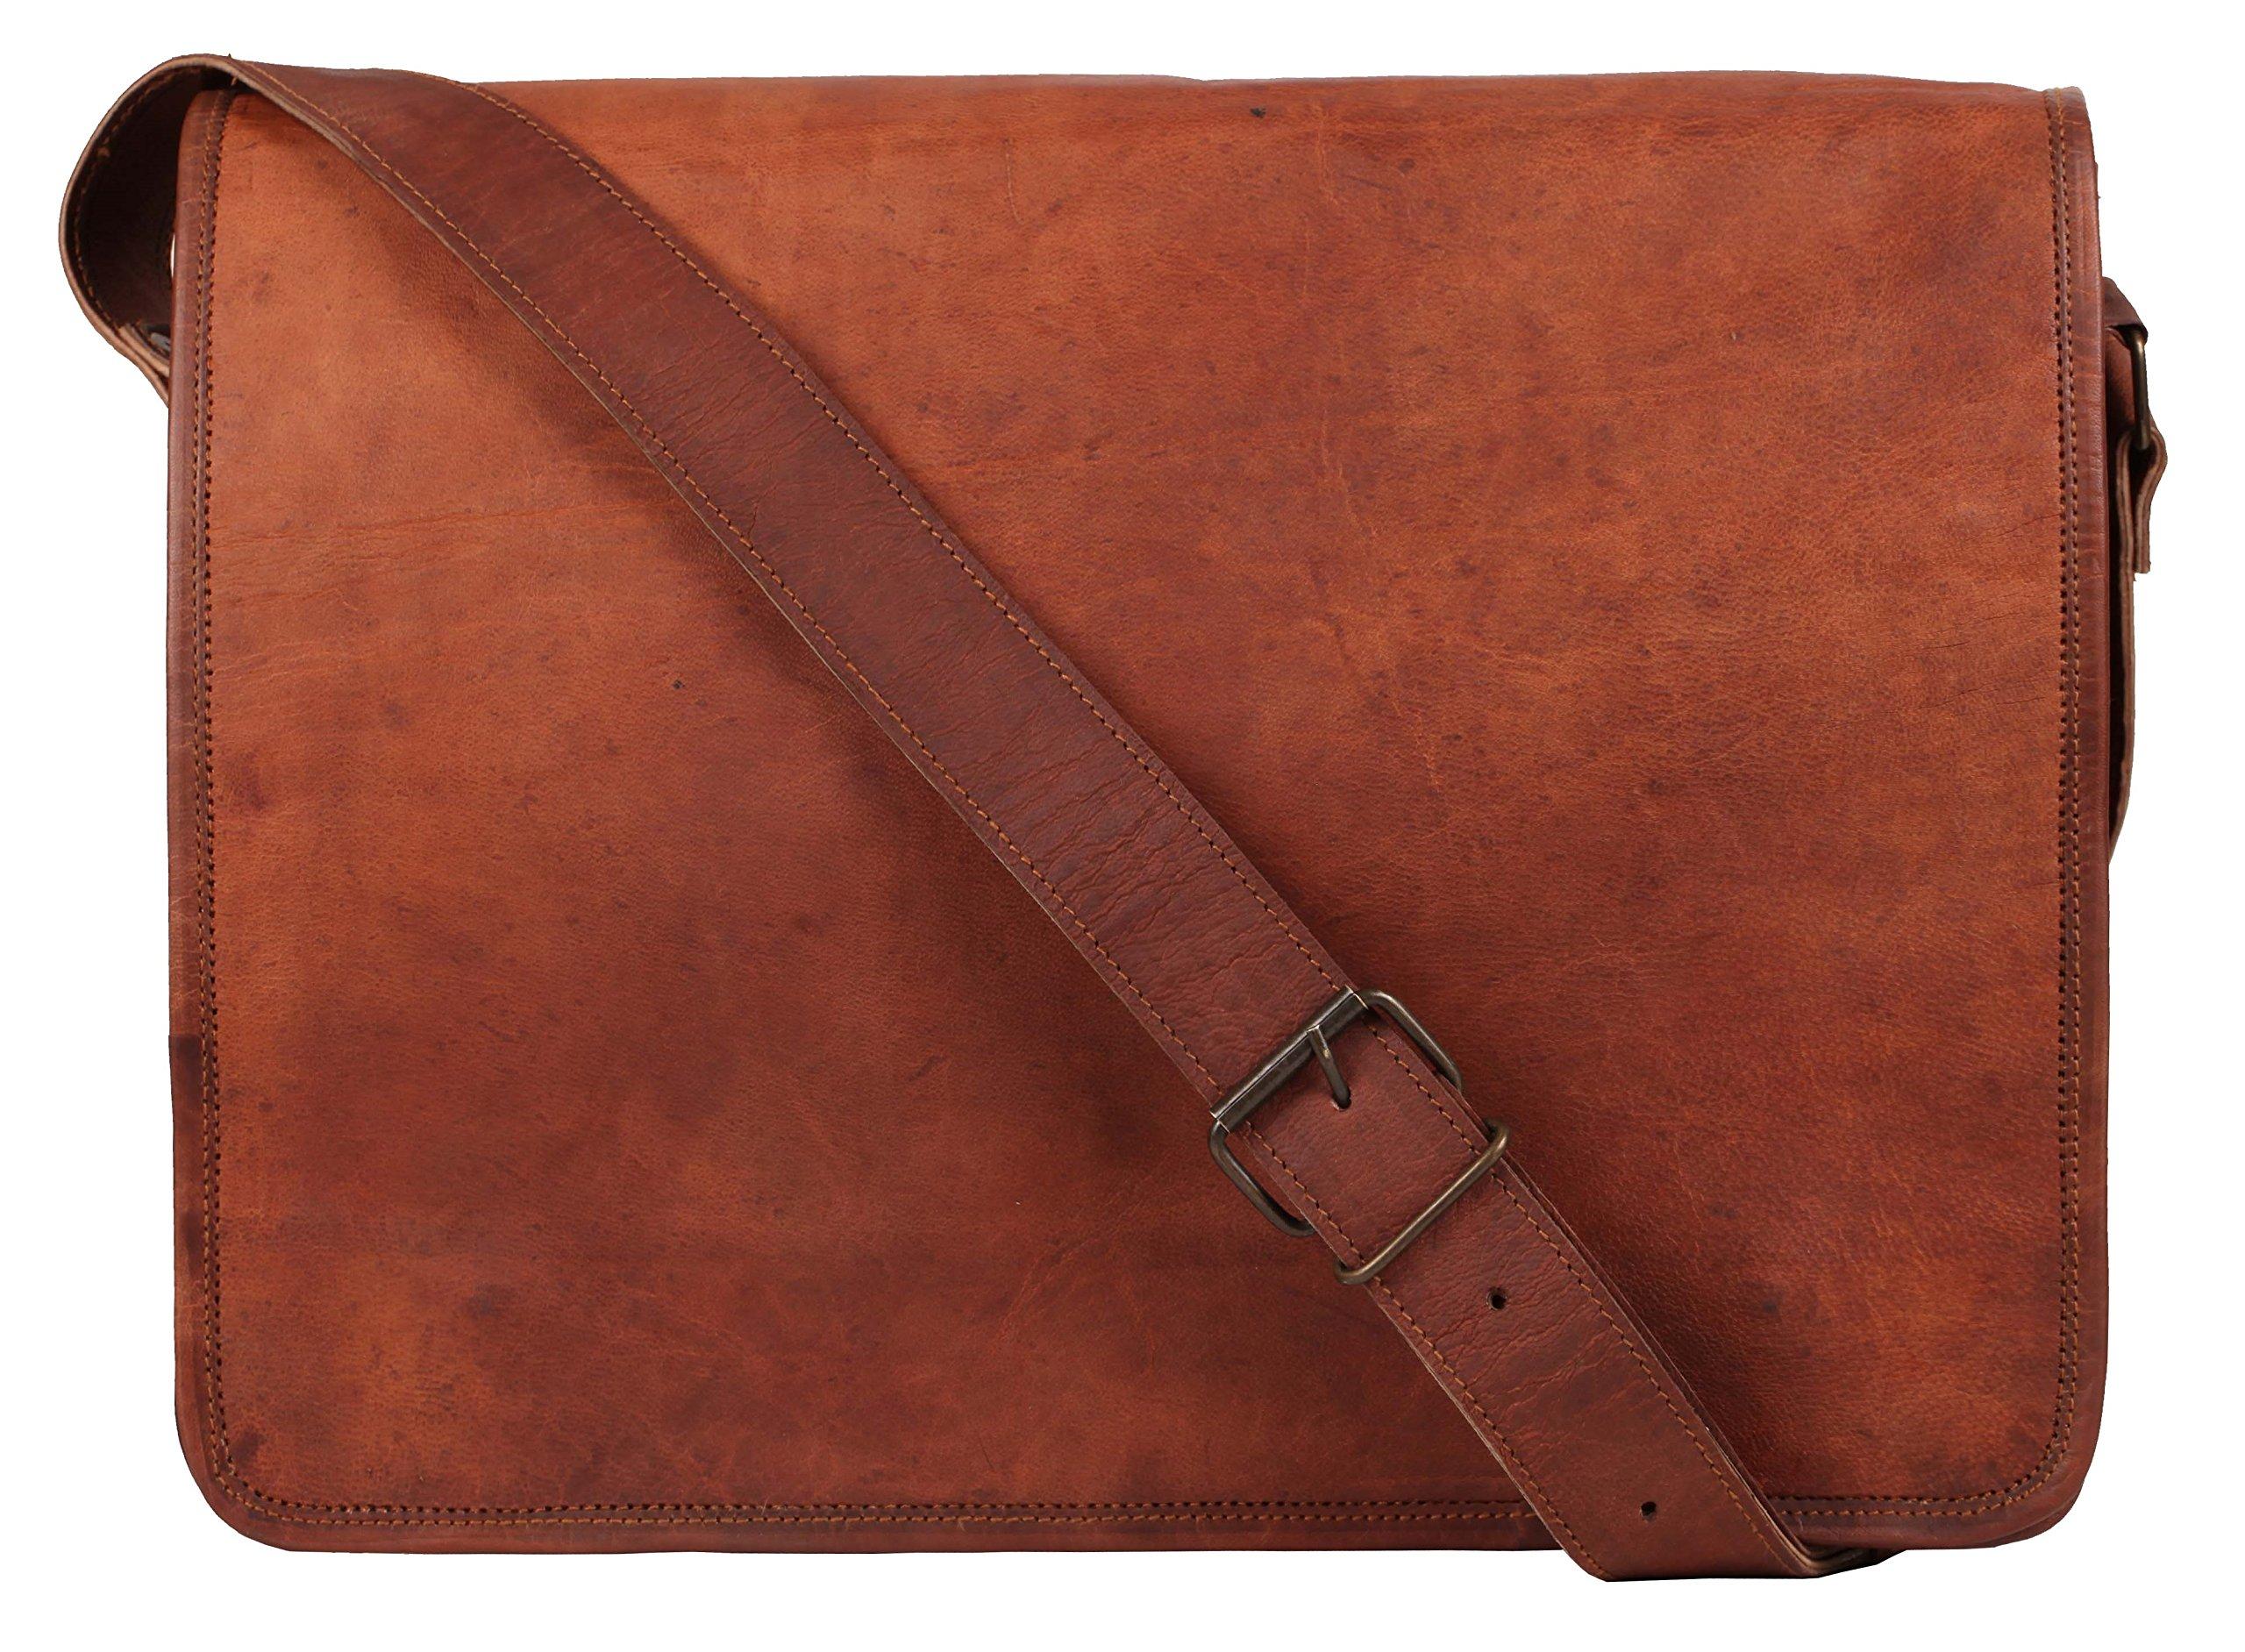 Rustic Town 15 inch Vintage Crossbody Genuine Leather Laptop Messenger Bag